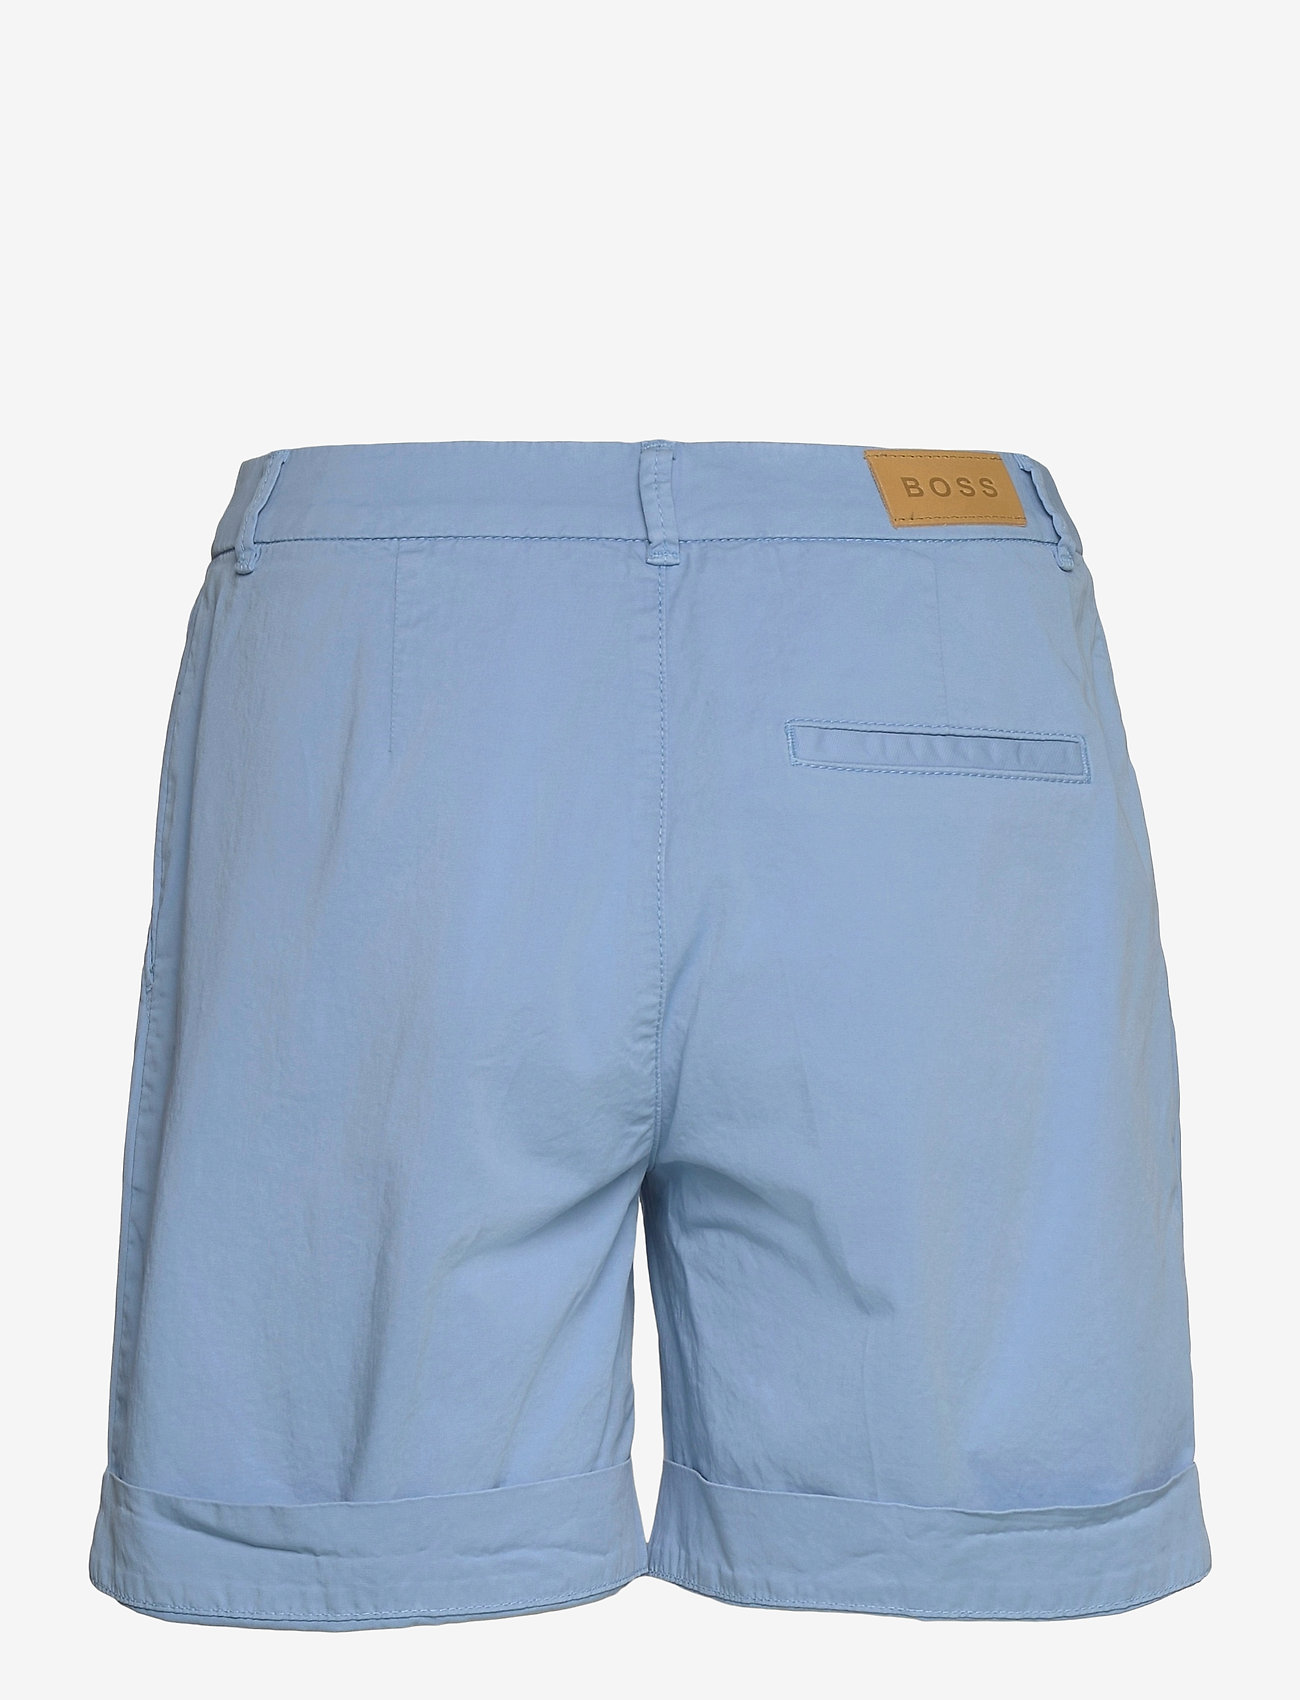 BOSS - C_Taggie-D - chino shorts - light/pastel blue - 1